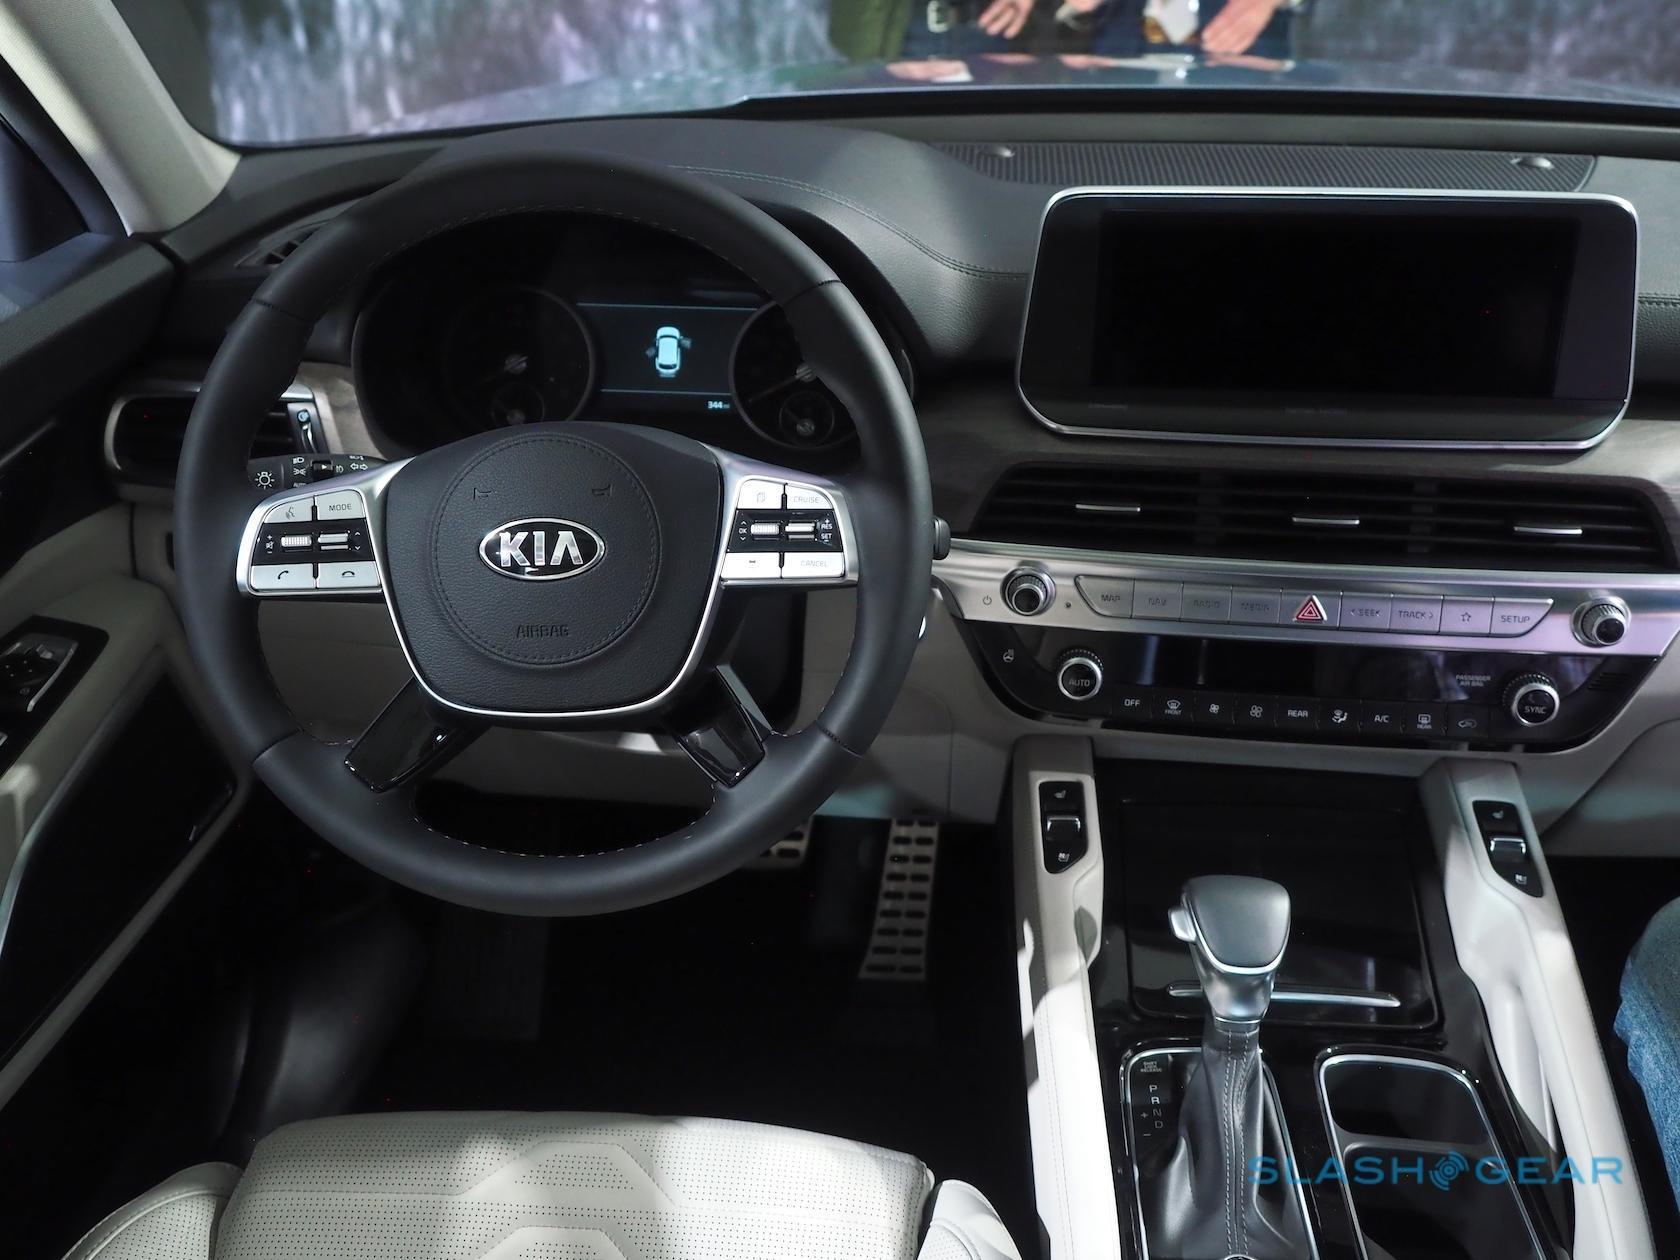 2020 Kia Telluride First Look Family Suv Meets Premium Flexibility